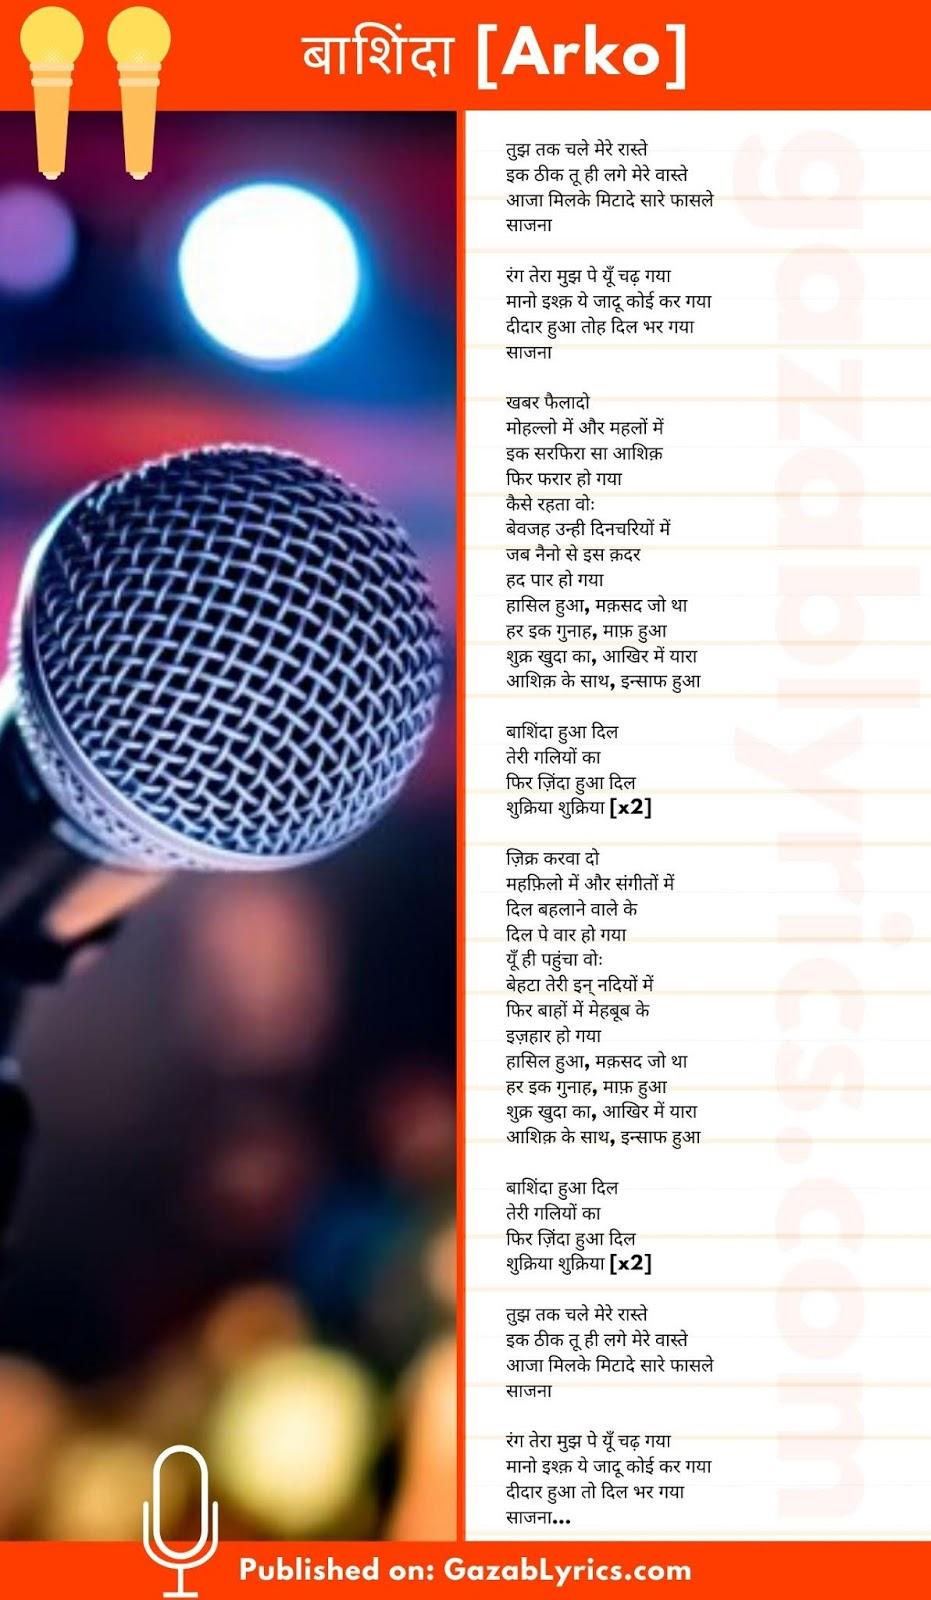 Baashinda song lyrics image